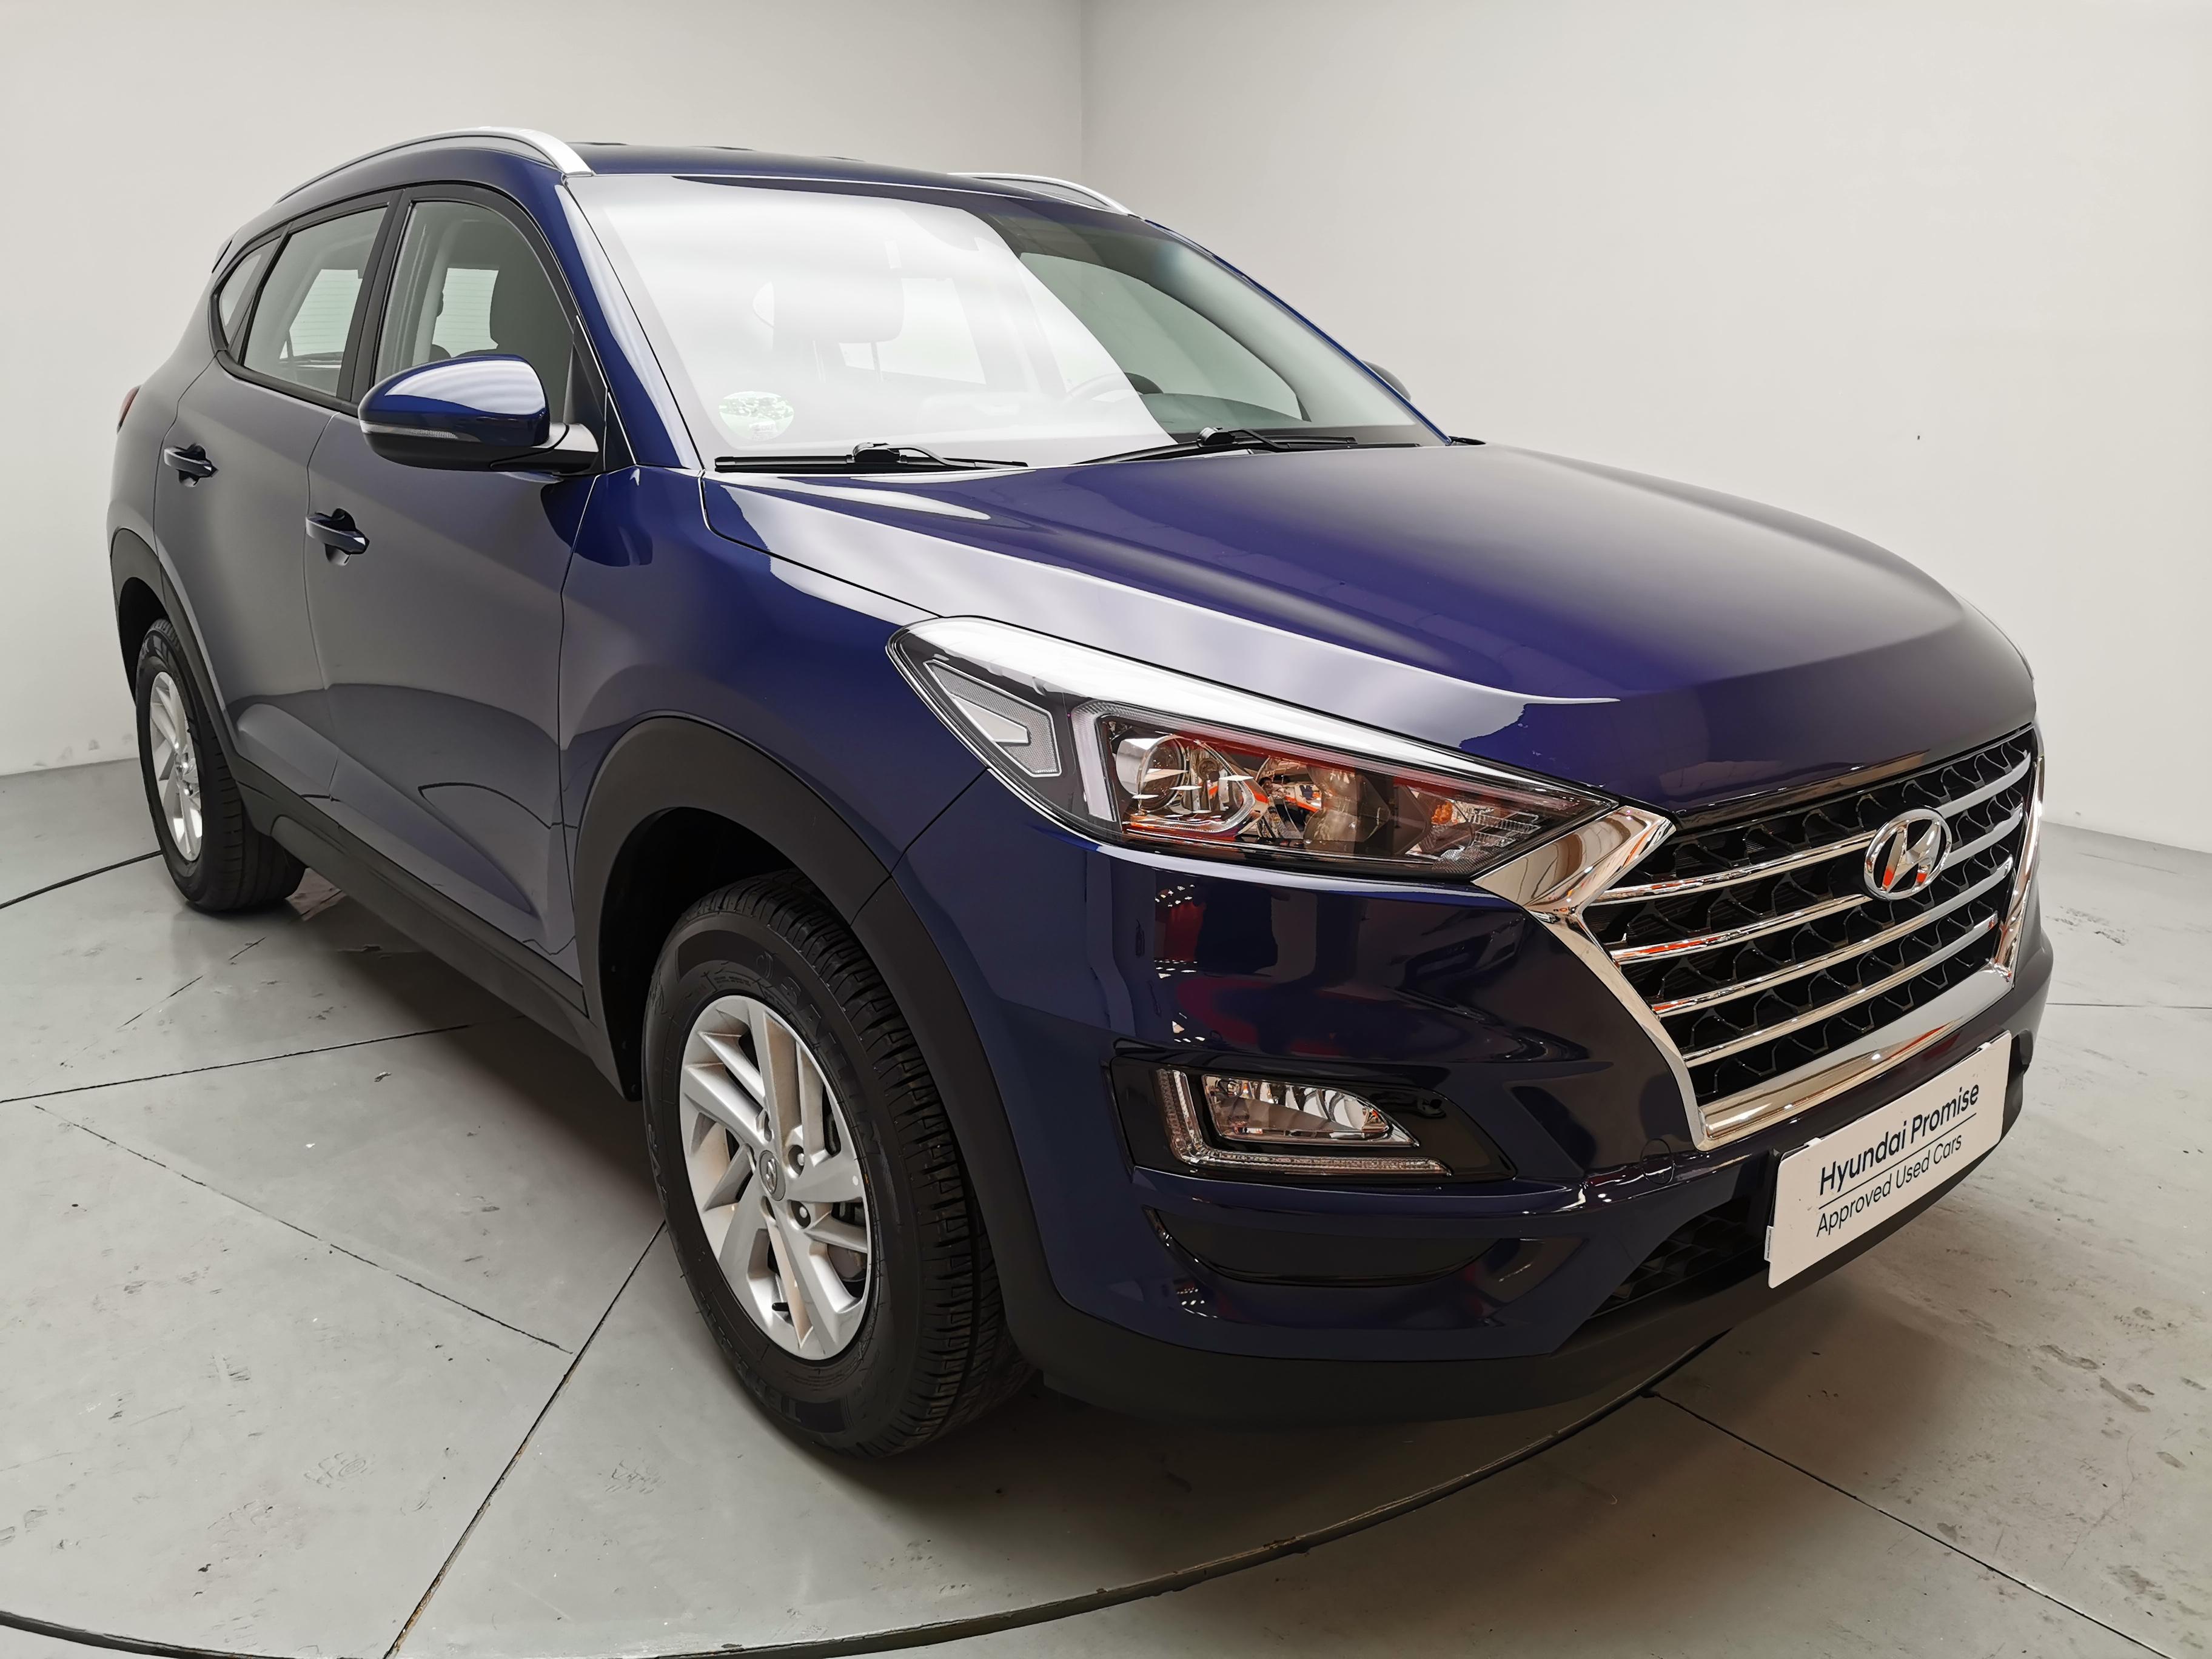 Array Hyundai Tucson 2020 Gasolina por 19.900€ en Málaga